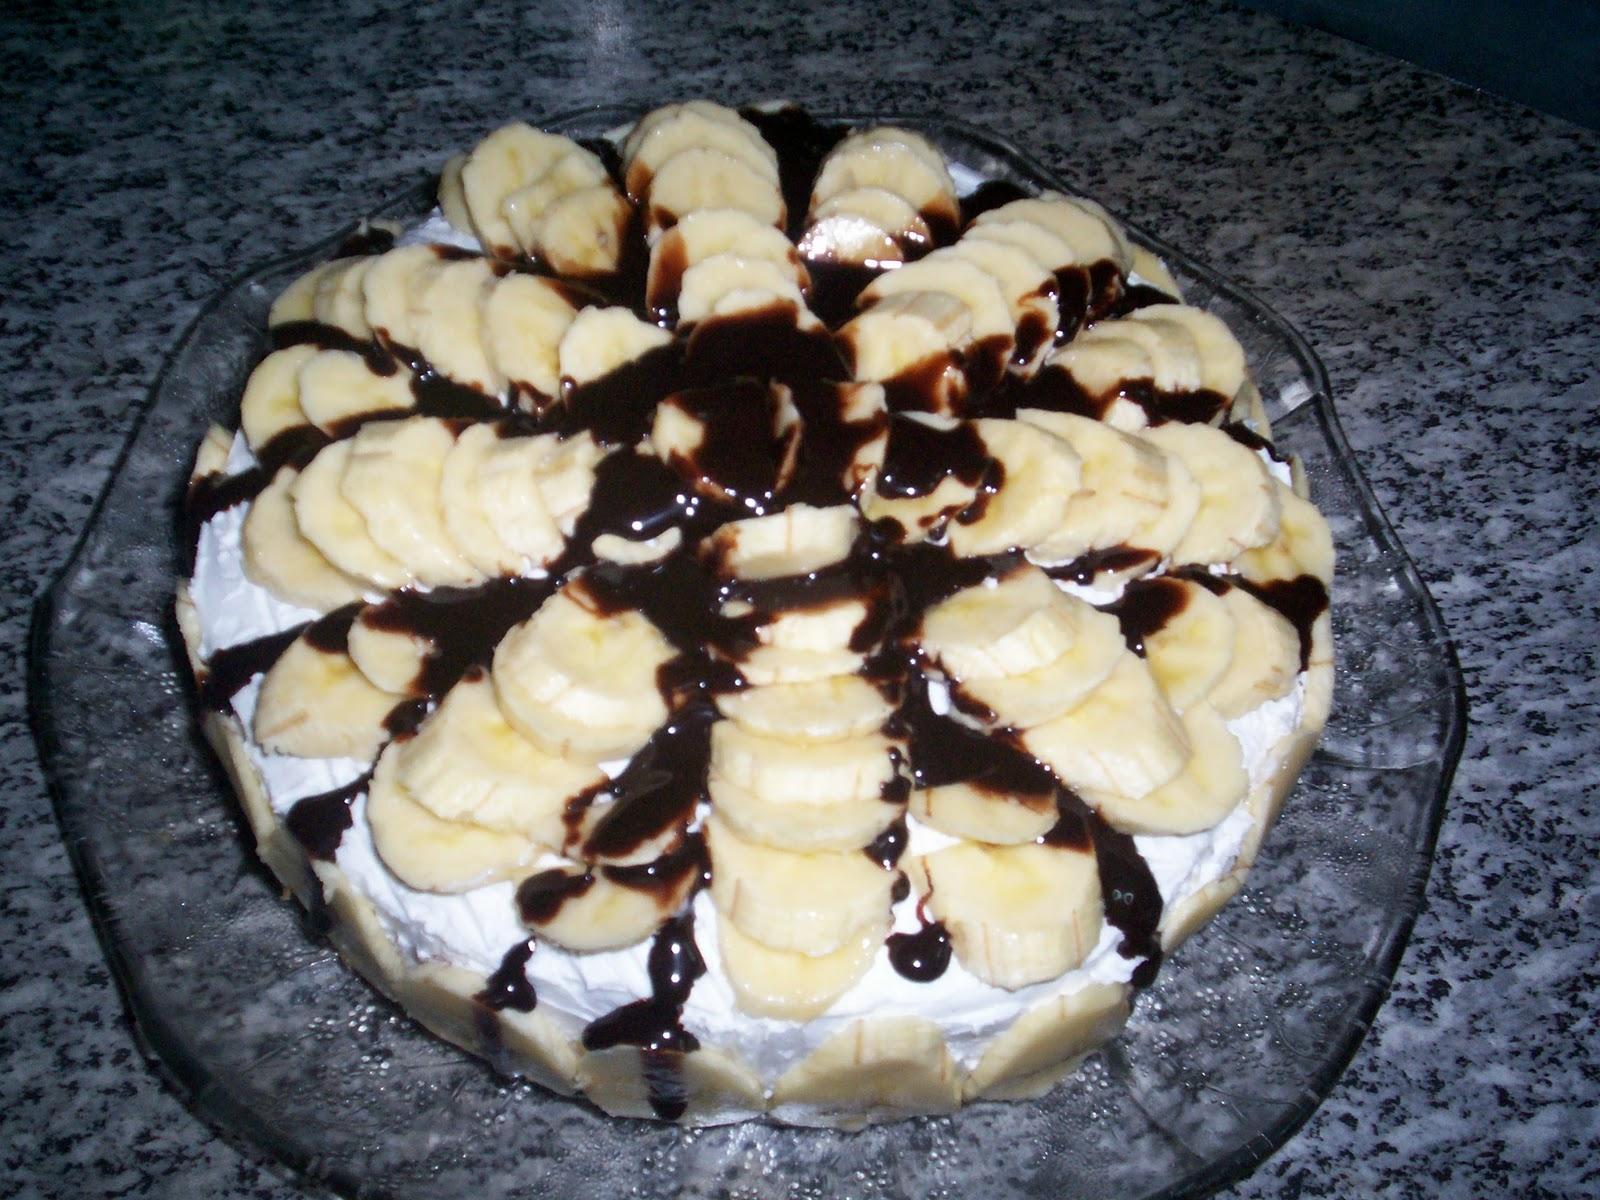 Muzlu Pasta Tarifleri - Muzlu Pasta Tarifleri Görselleri 3